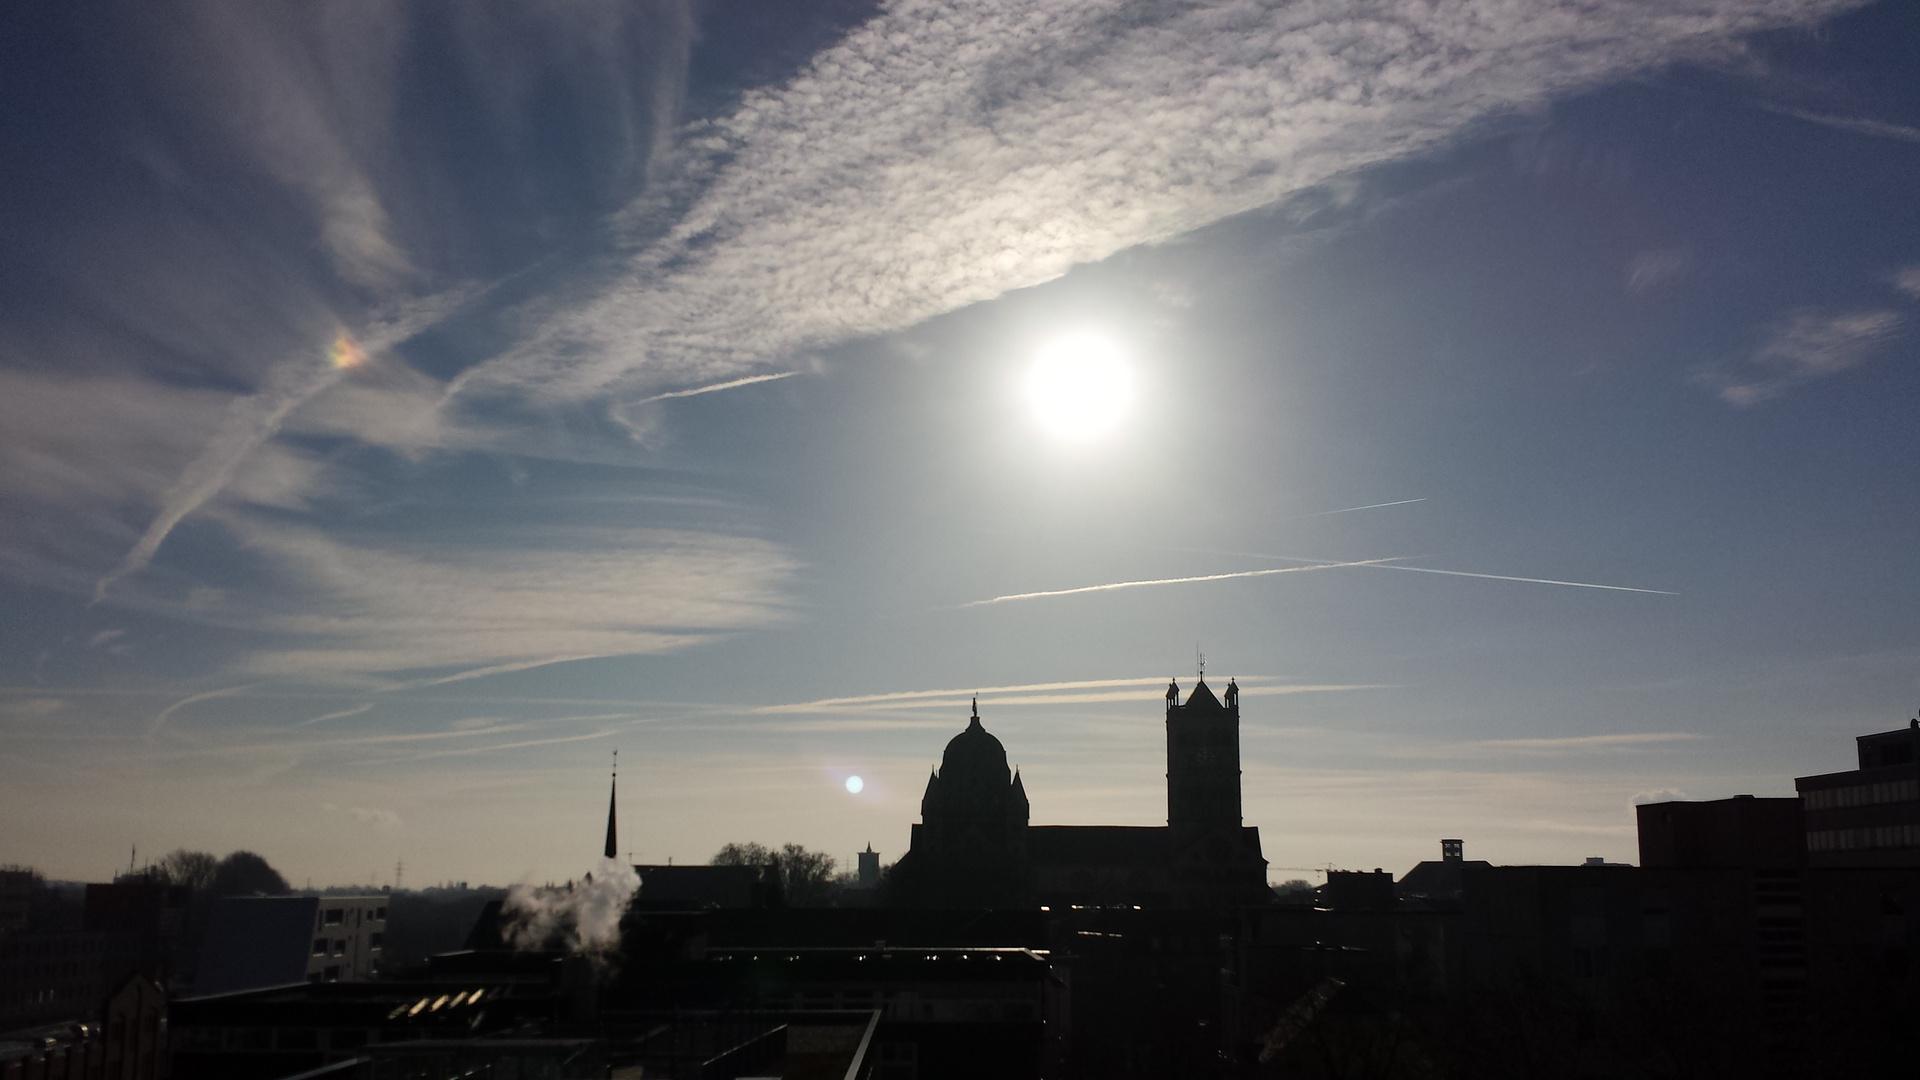 Januarsonne über Neuss / january sun over Neuss